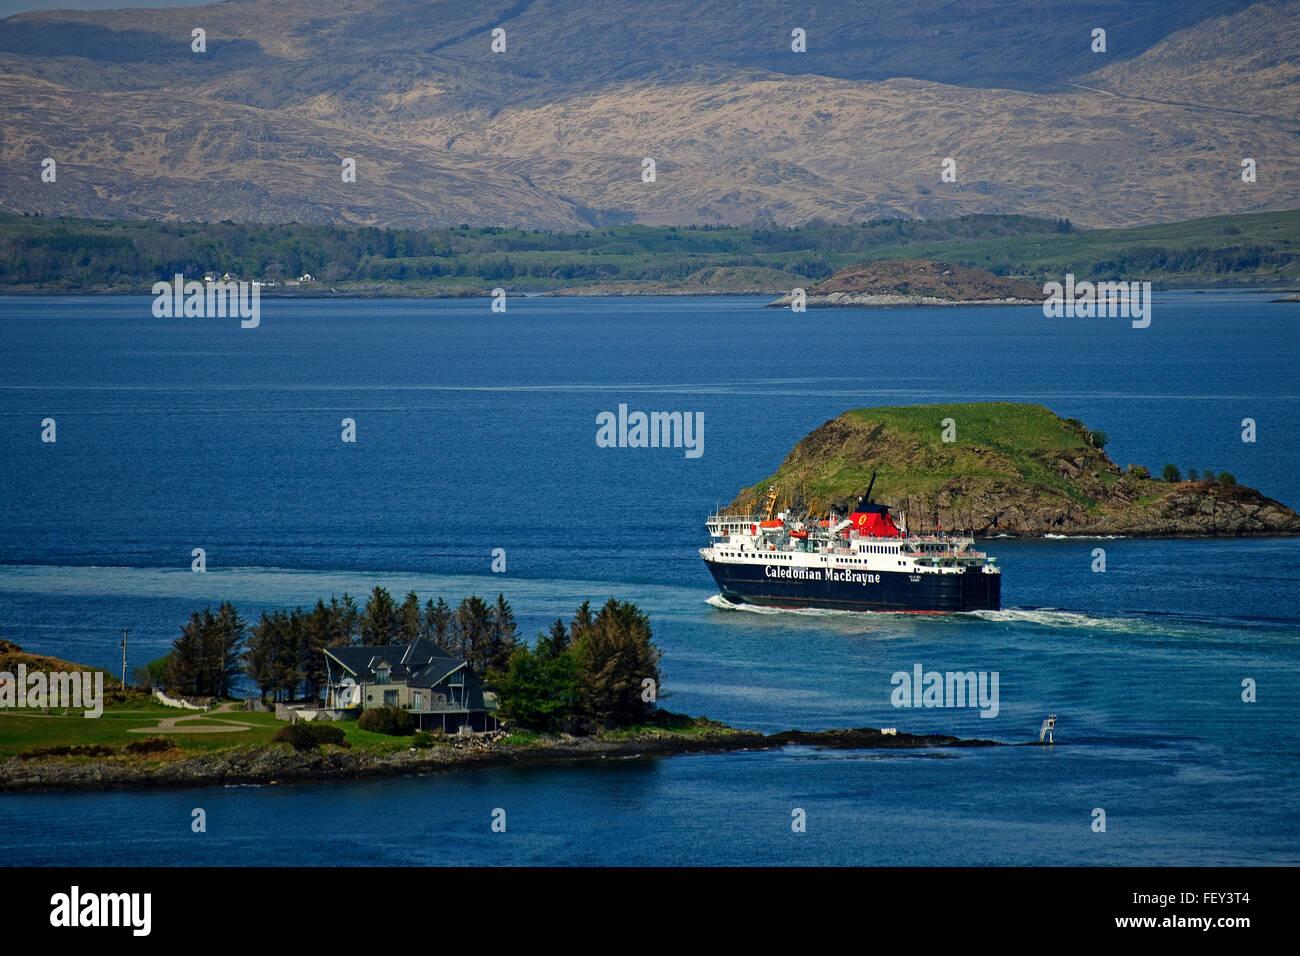 The MV Isle of Mull departs for Craignure, Oban, Argyll - Stock Image